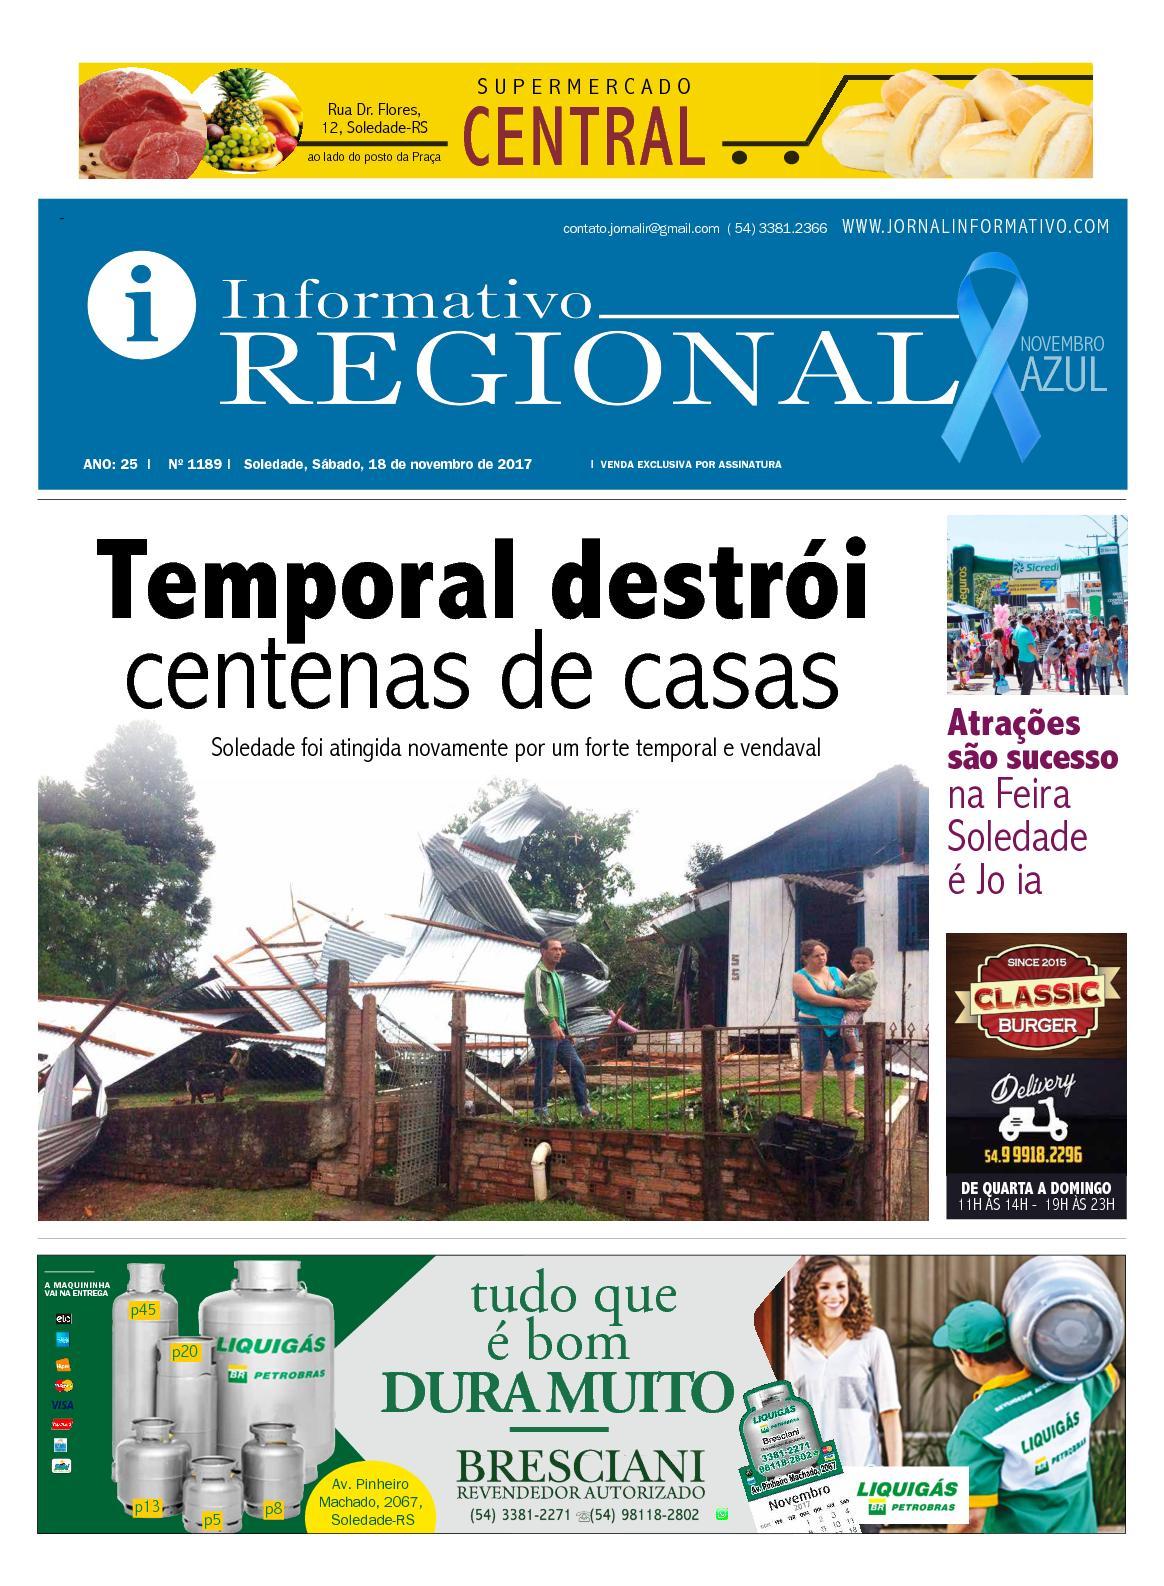 Calaméo - 1189 Informativo Regional a0ff121bd7